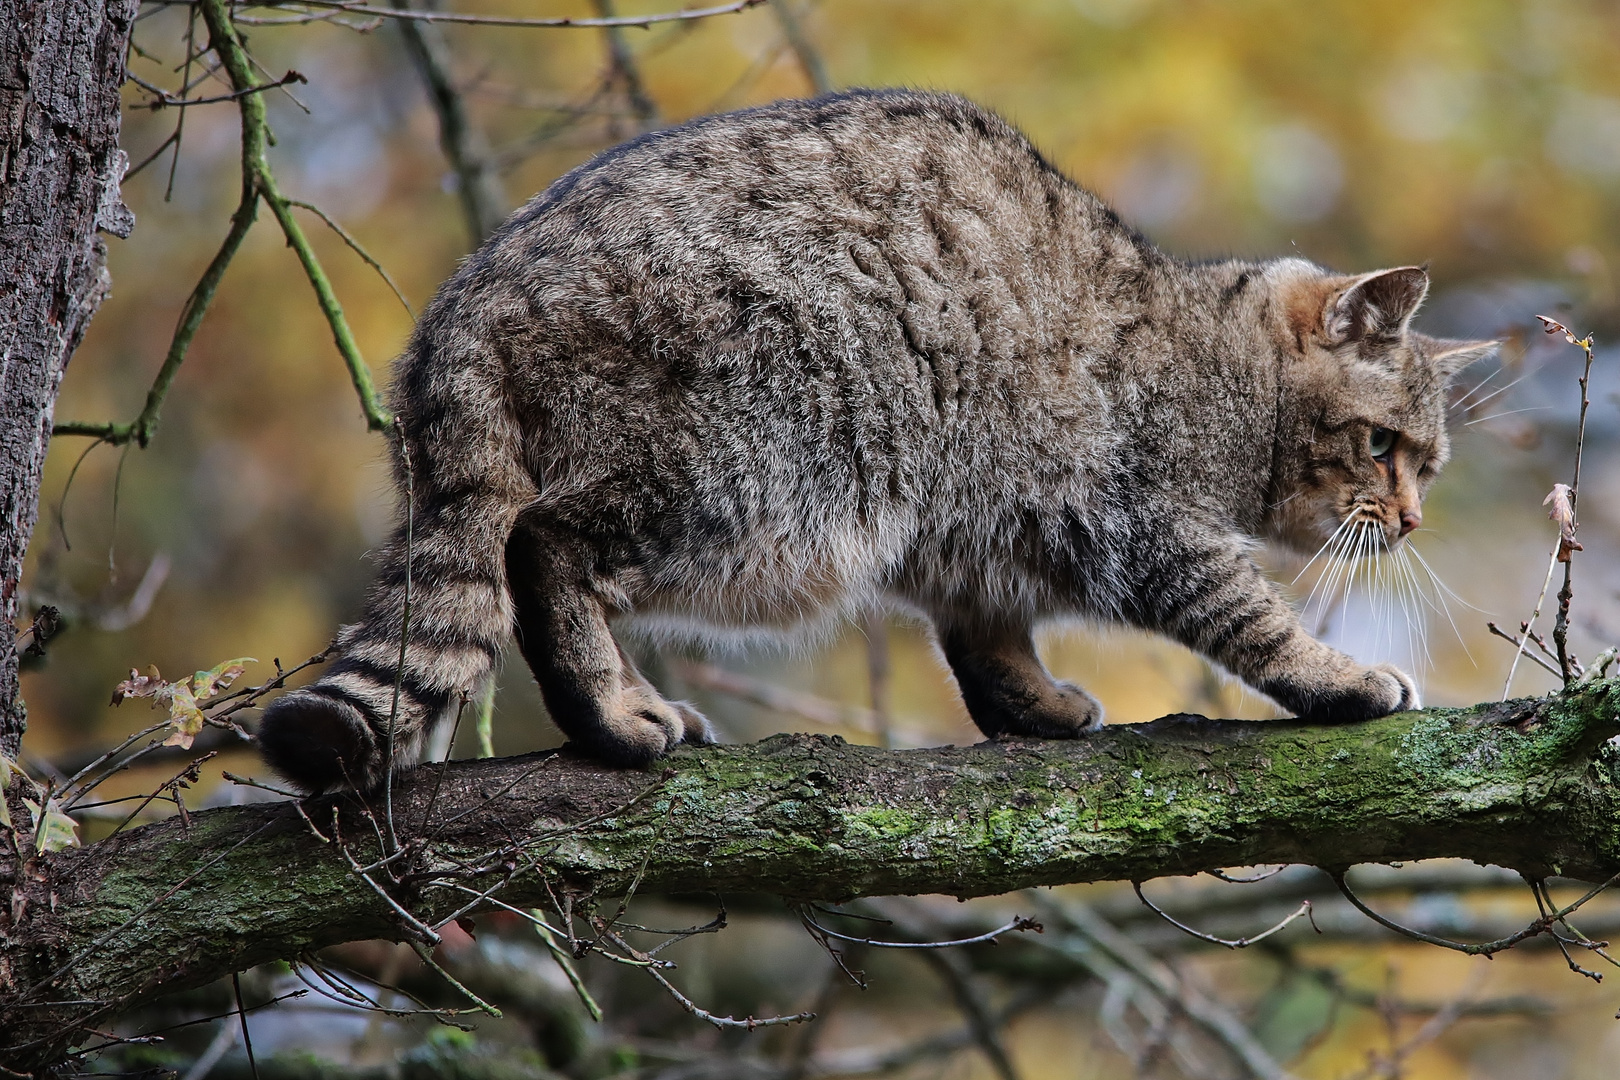 Europäische Wildkatze (Felis silvestris silvestris)